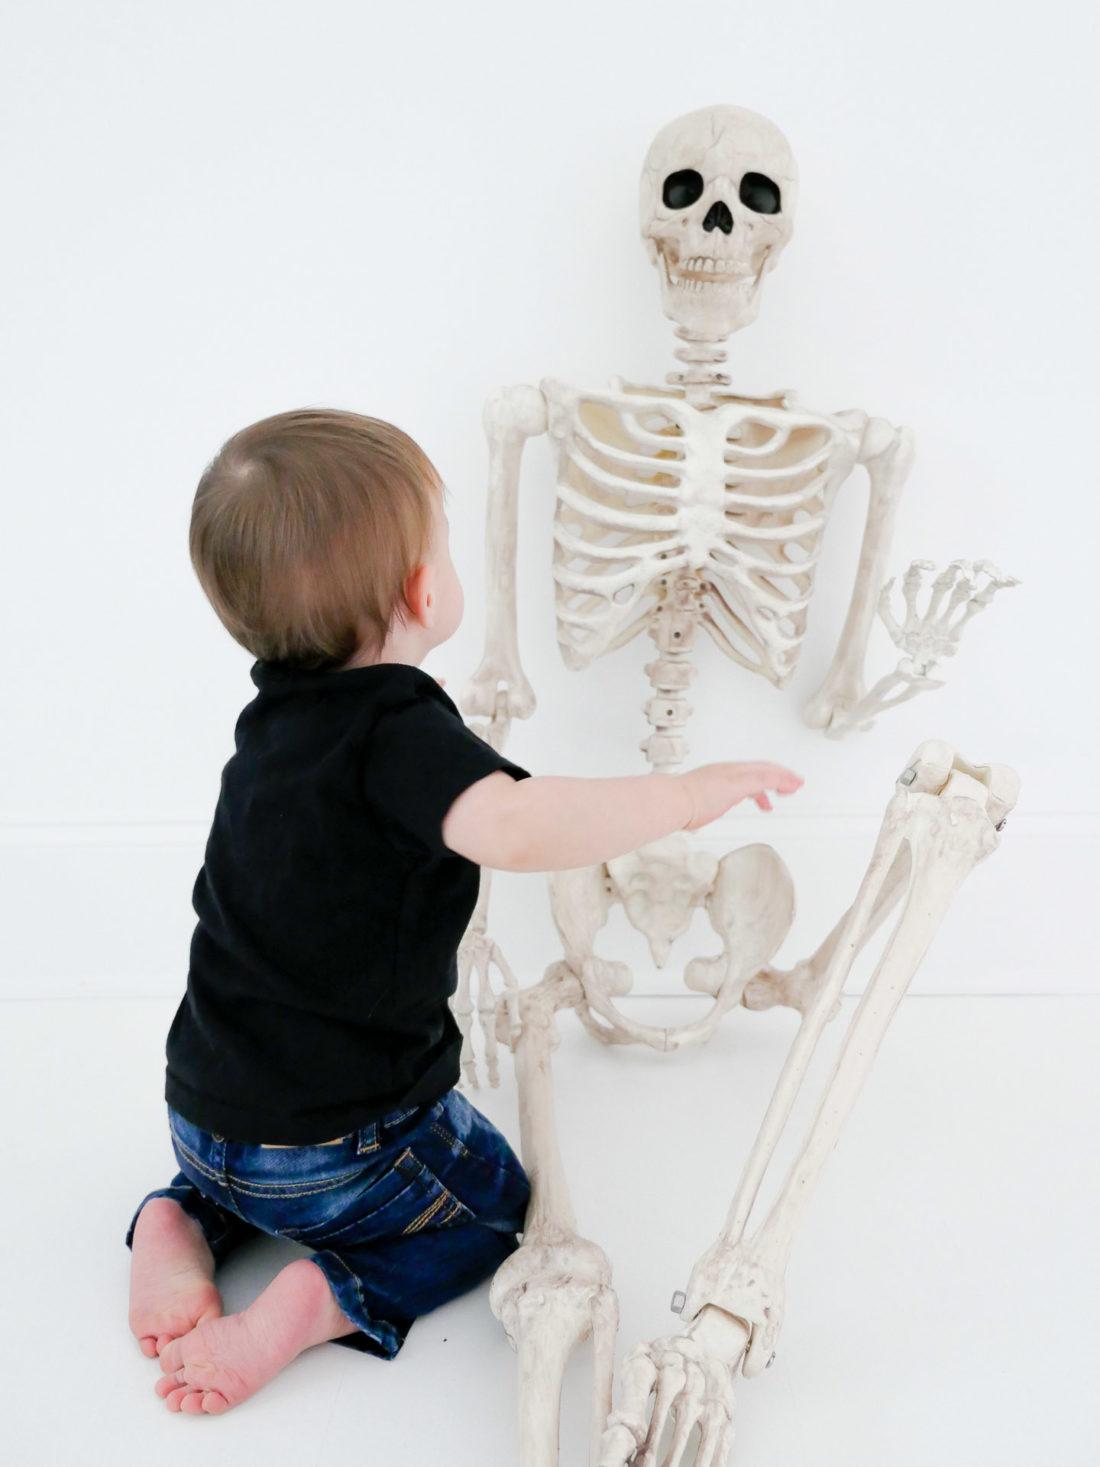 Major Martino wears a custom Halloween themed tee shirt and crawls towards a skeleton decoration